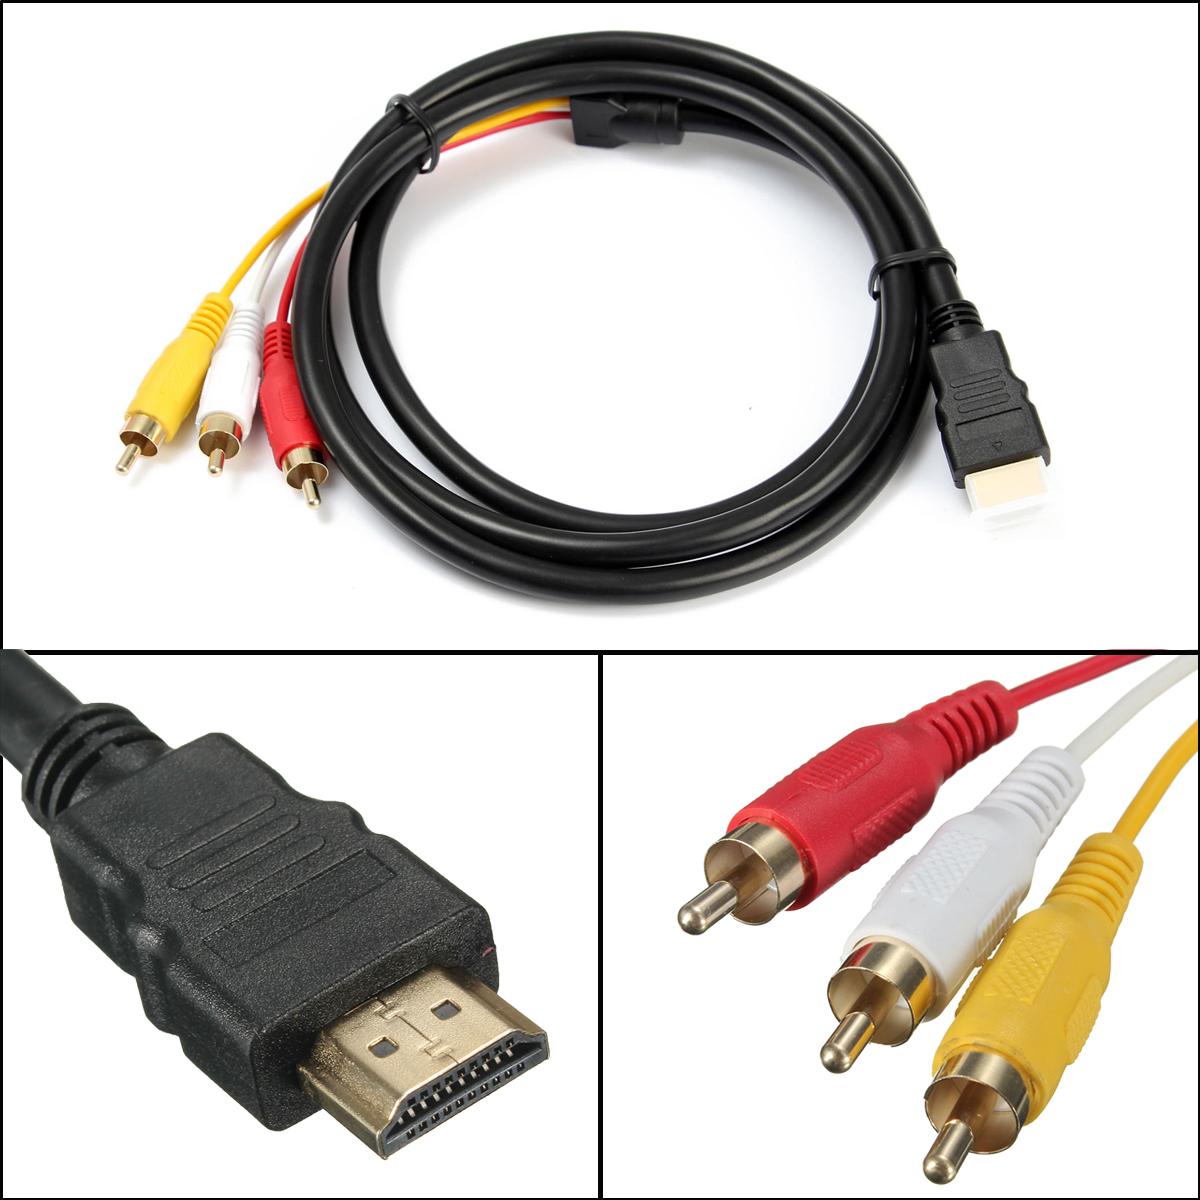 audio video av adapter cinch kabel hdmi stecker auf 3 rca. Black Bedroom Furniture Sets. Home Design Ideas